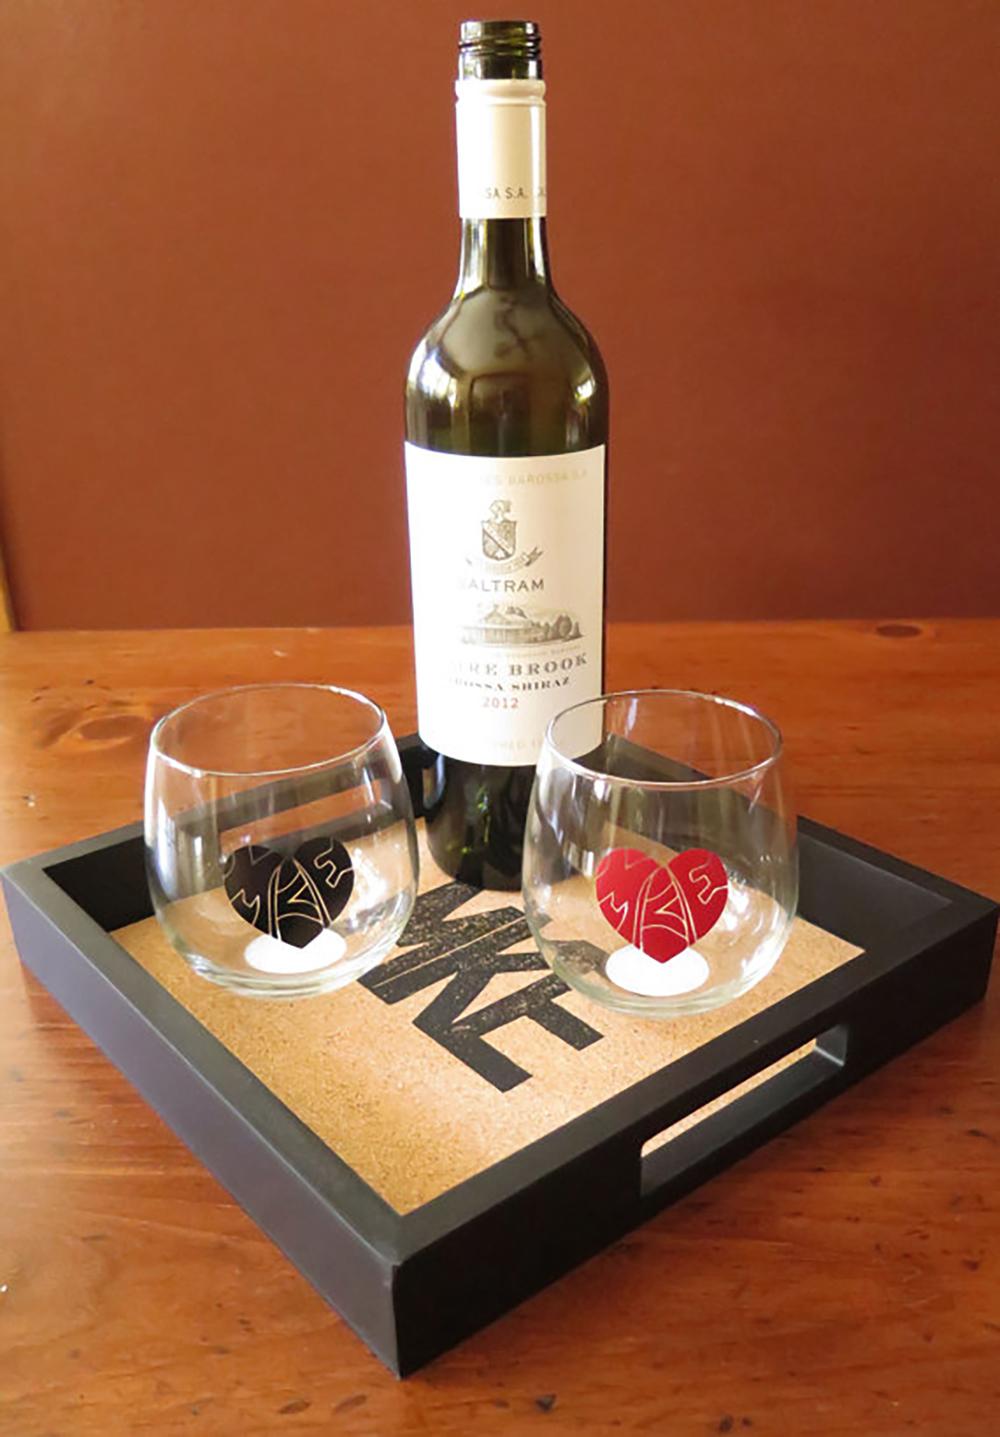 MKE cork serving tray $50,MKE love glasses $12